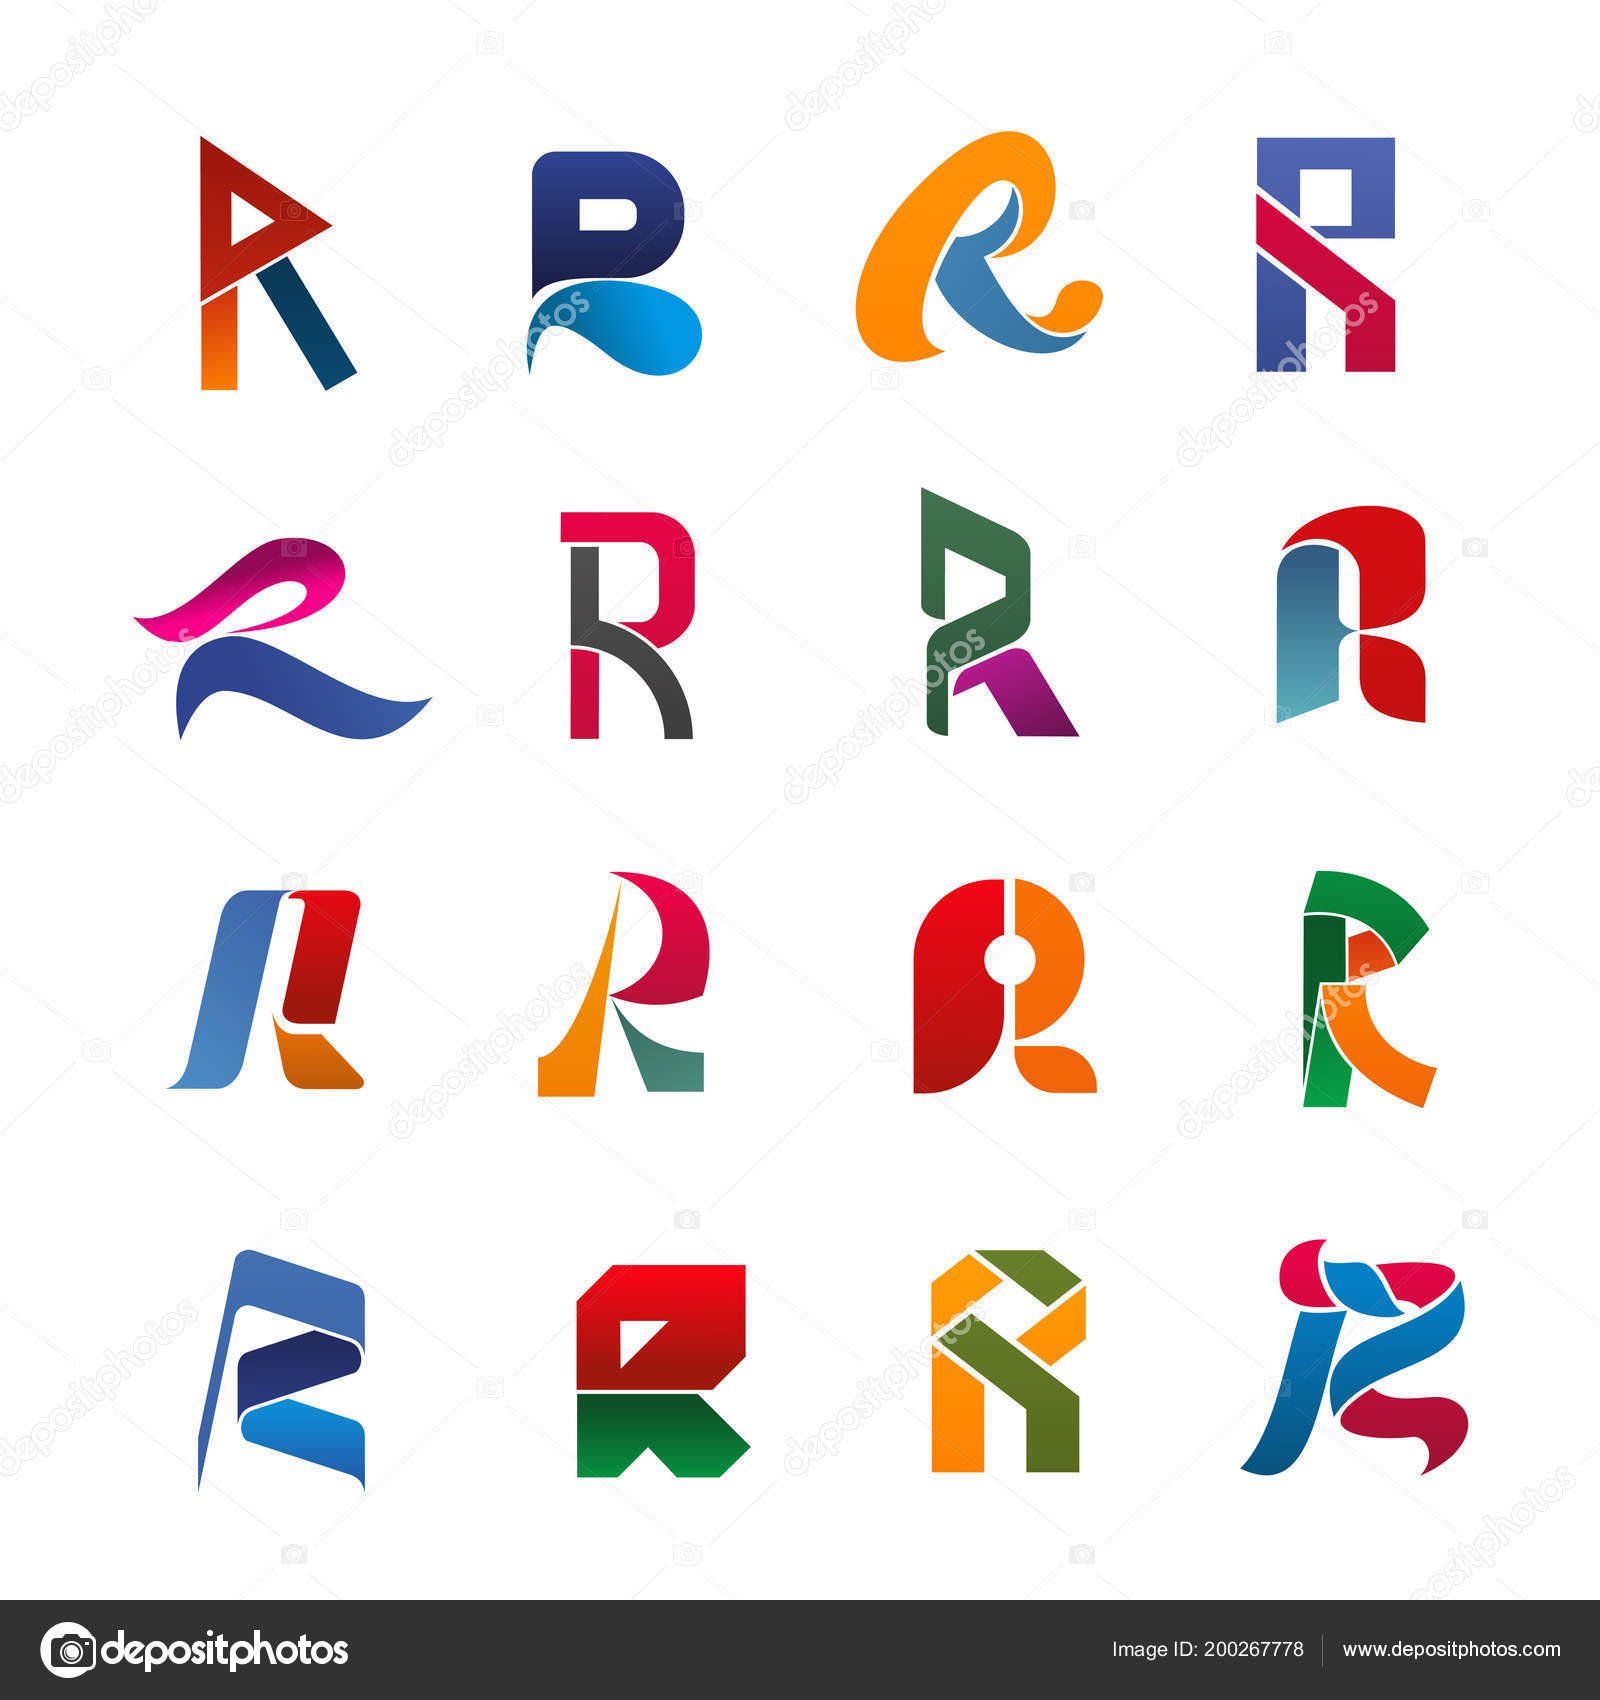 Police De Caracteres Majuscules R Forme Ruban Papier Origami Et Figure Geometrique Pour Corporate Branding Modele Carte Visite